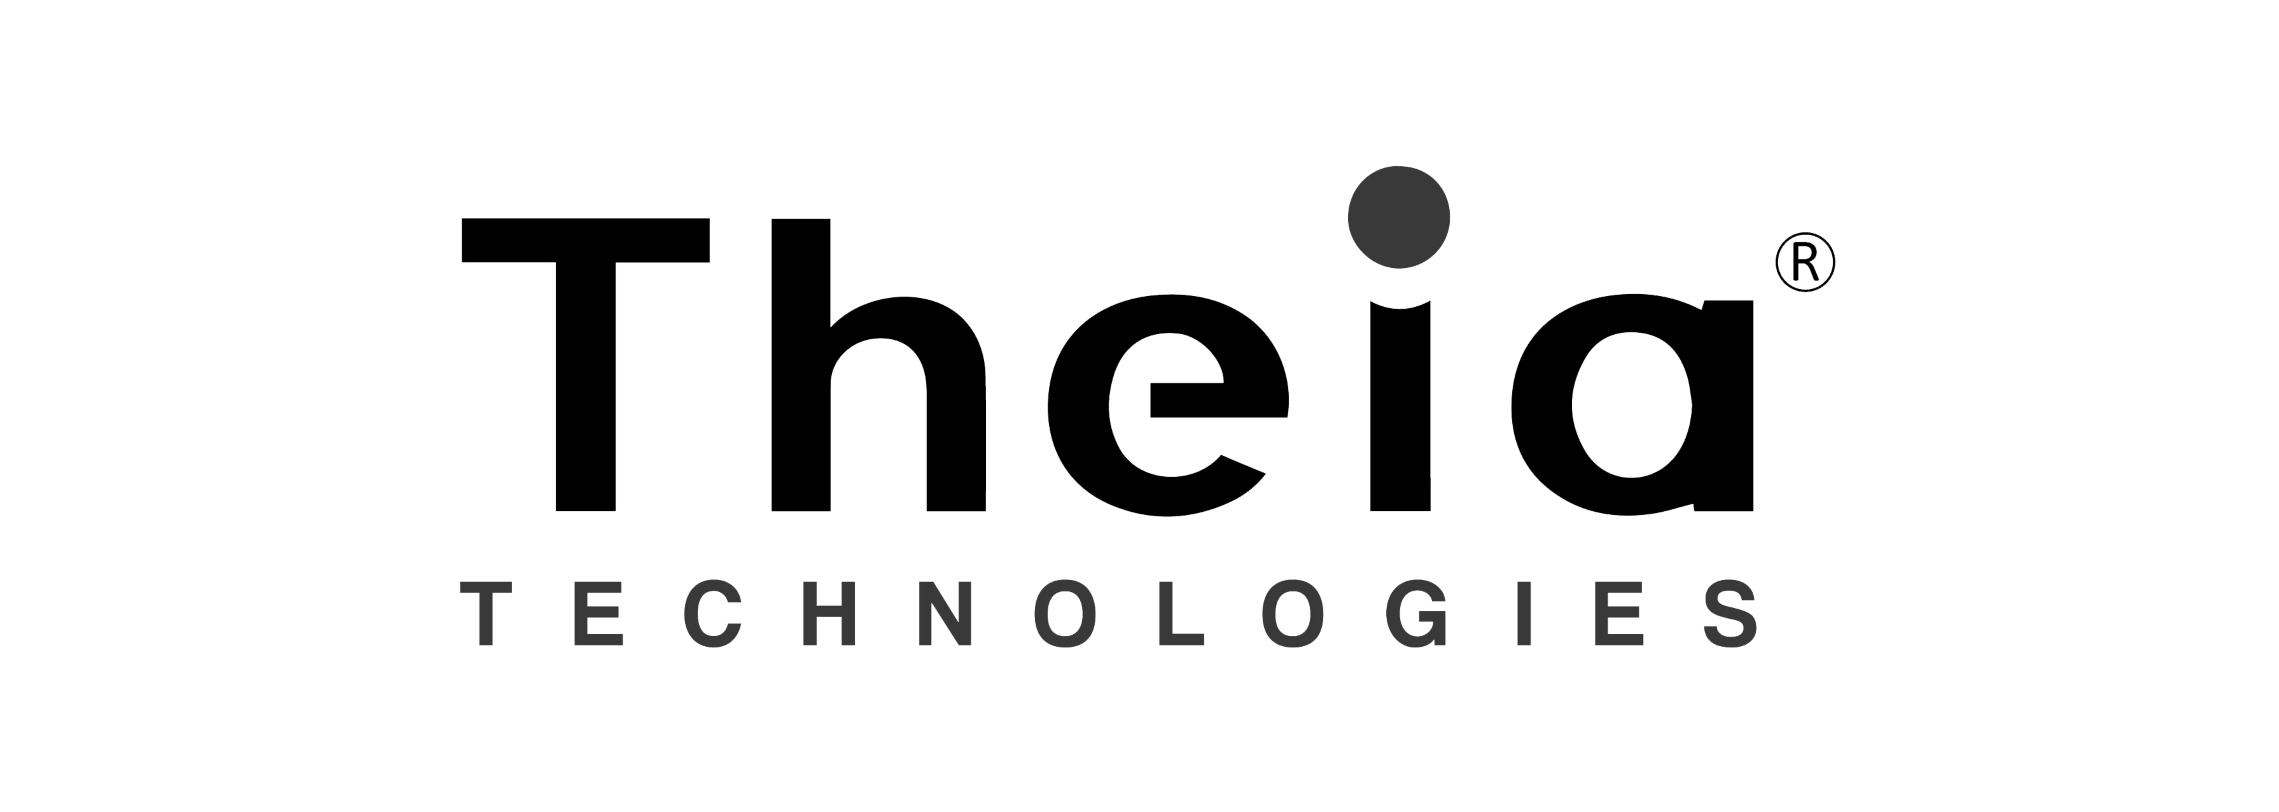 Theia Technologies logo-reg-lg-bw-small